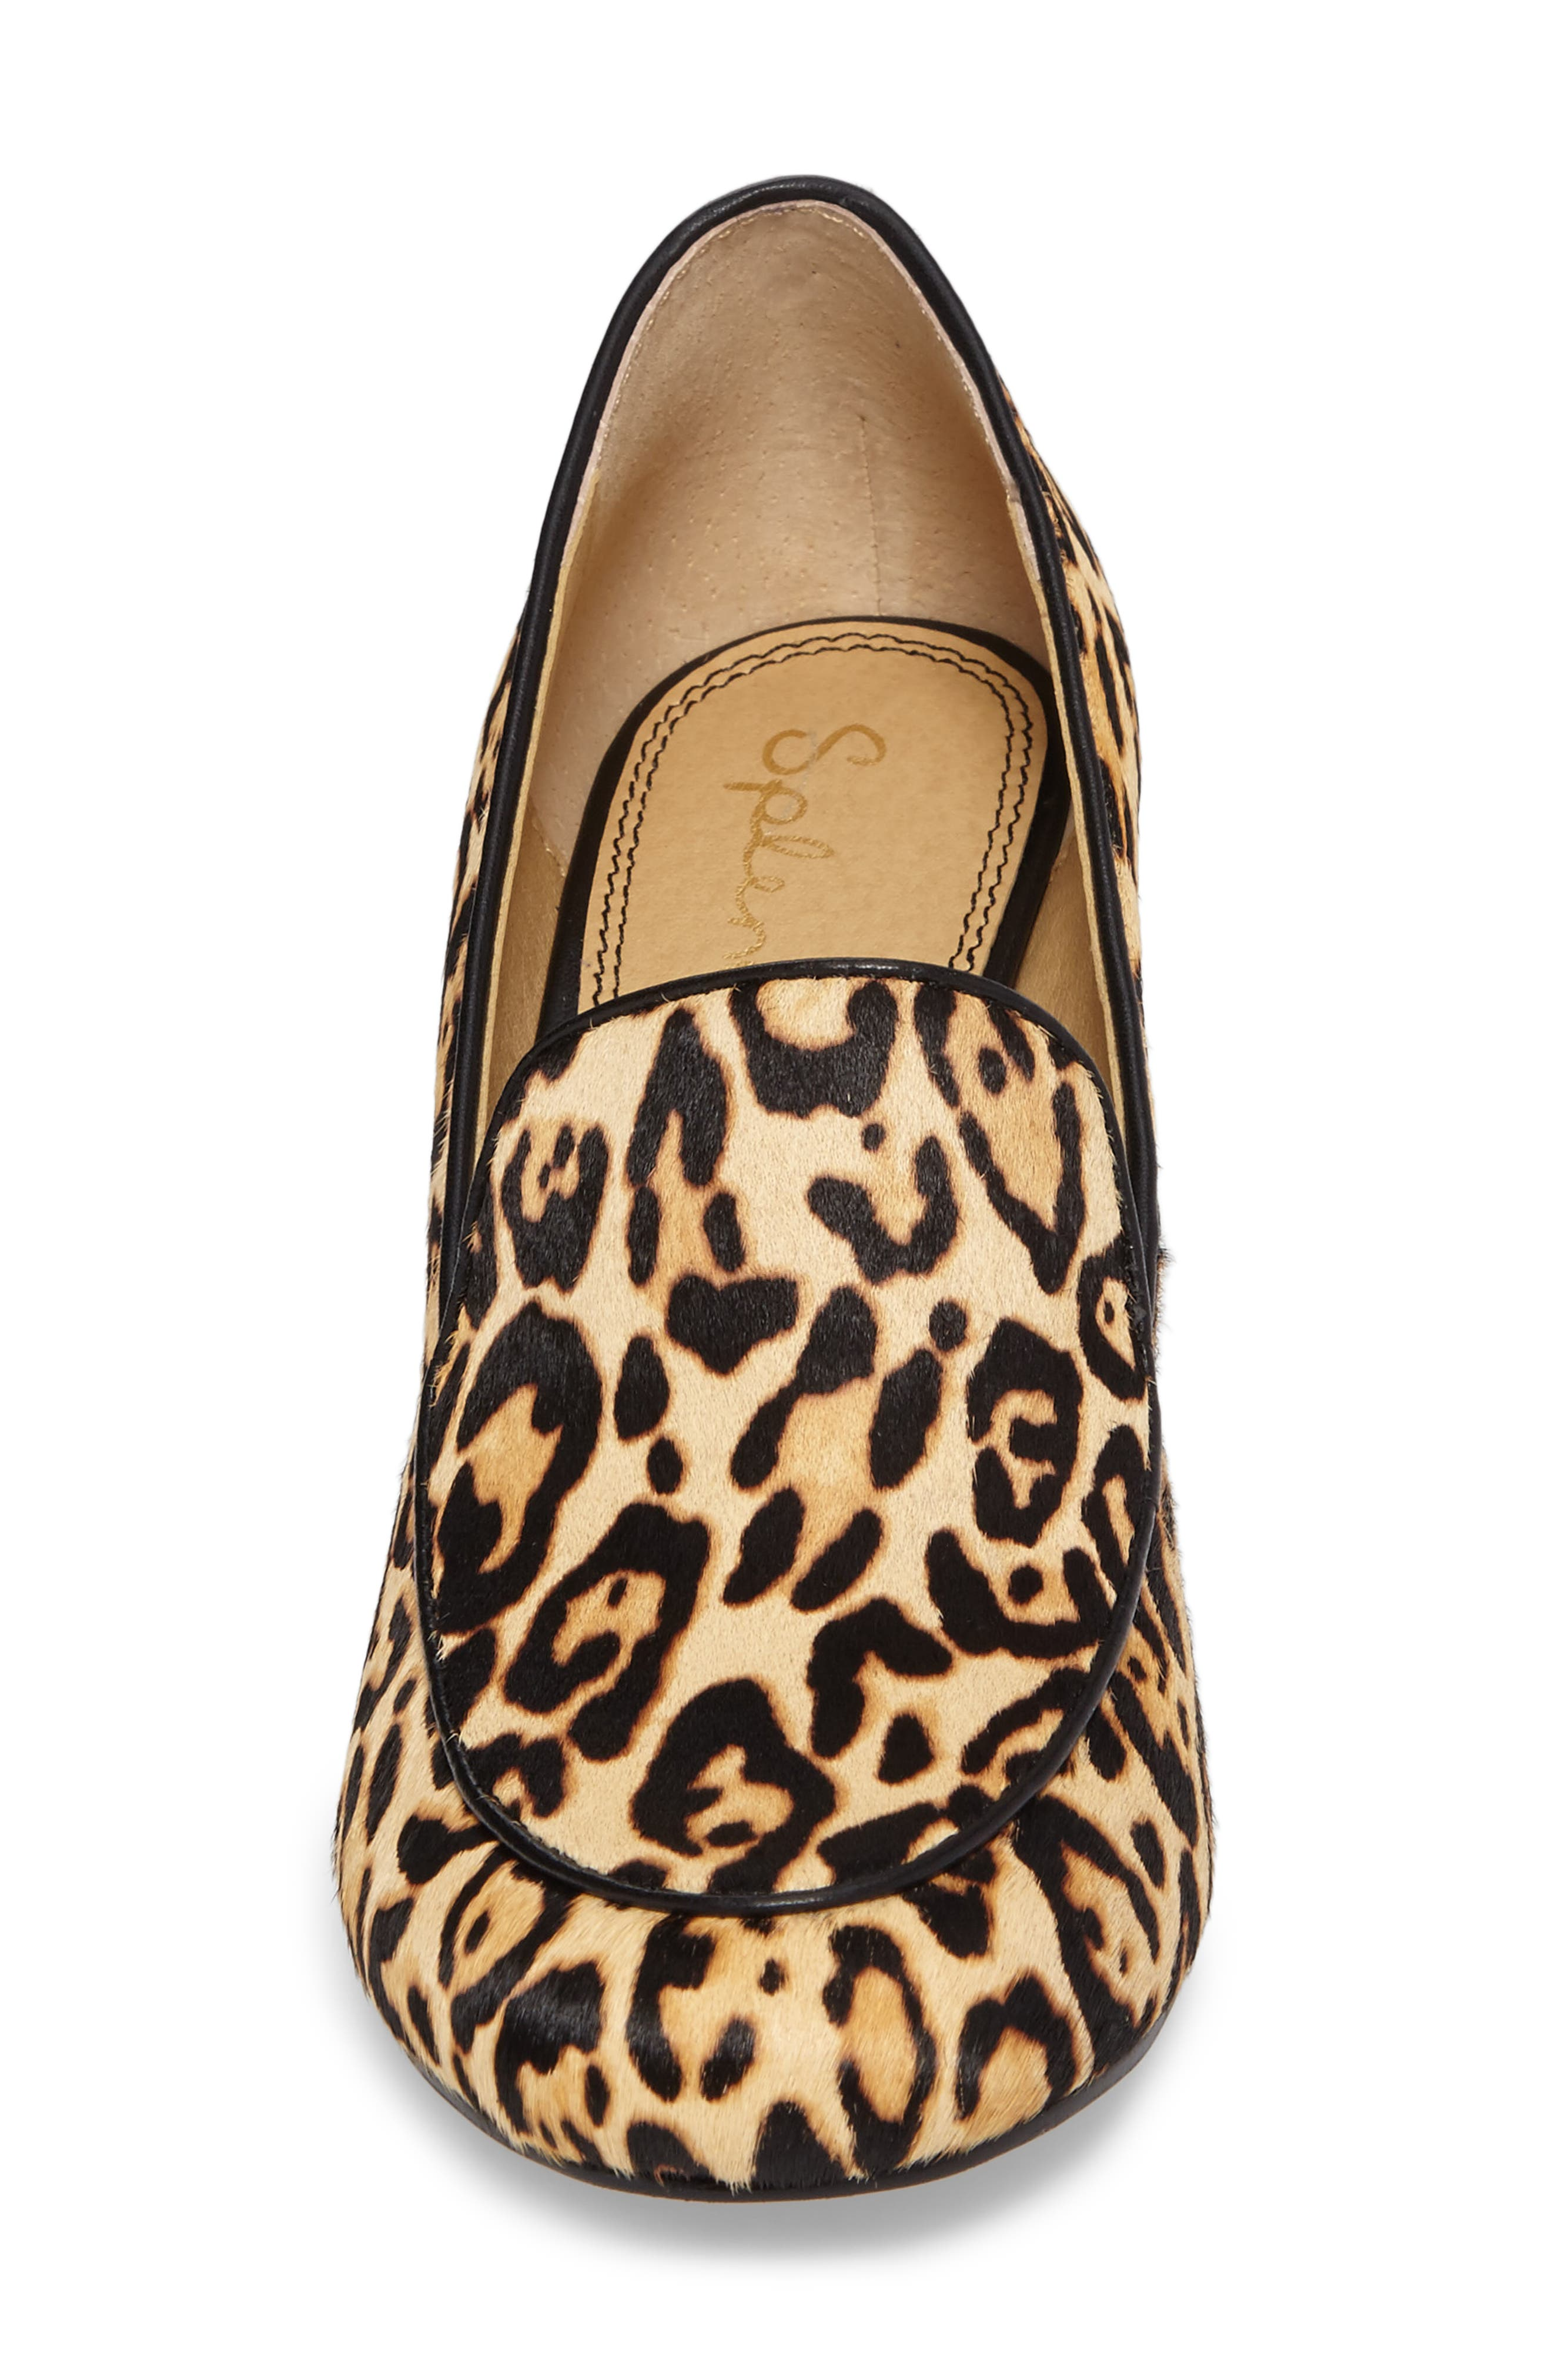 Rosita III Genuine Calf Hair Loafer Pump,                             Alternate thumbnail 4, color,                             200